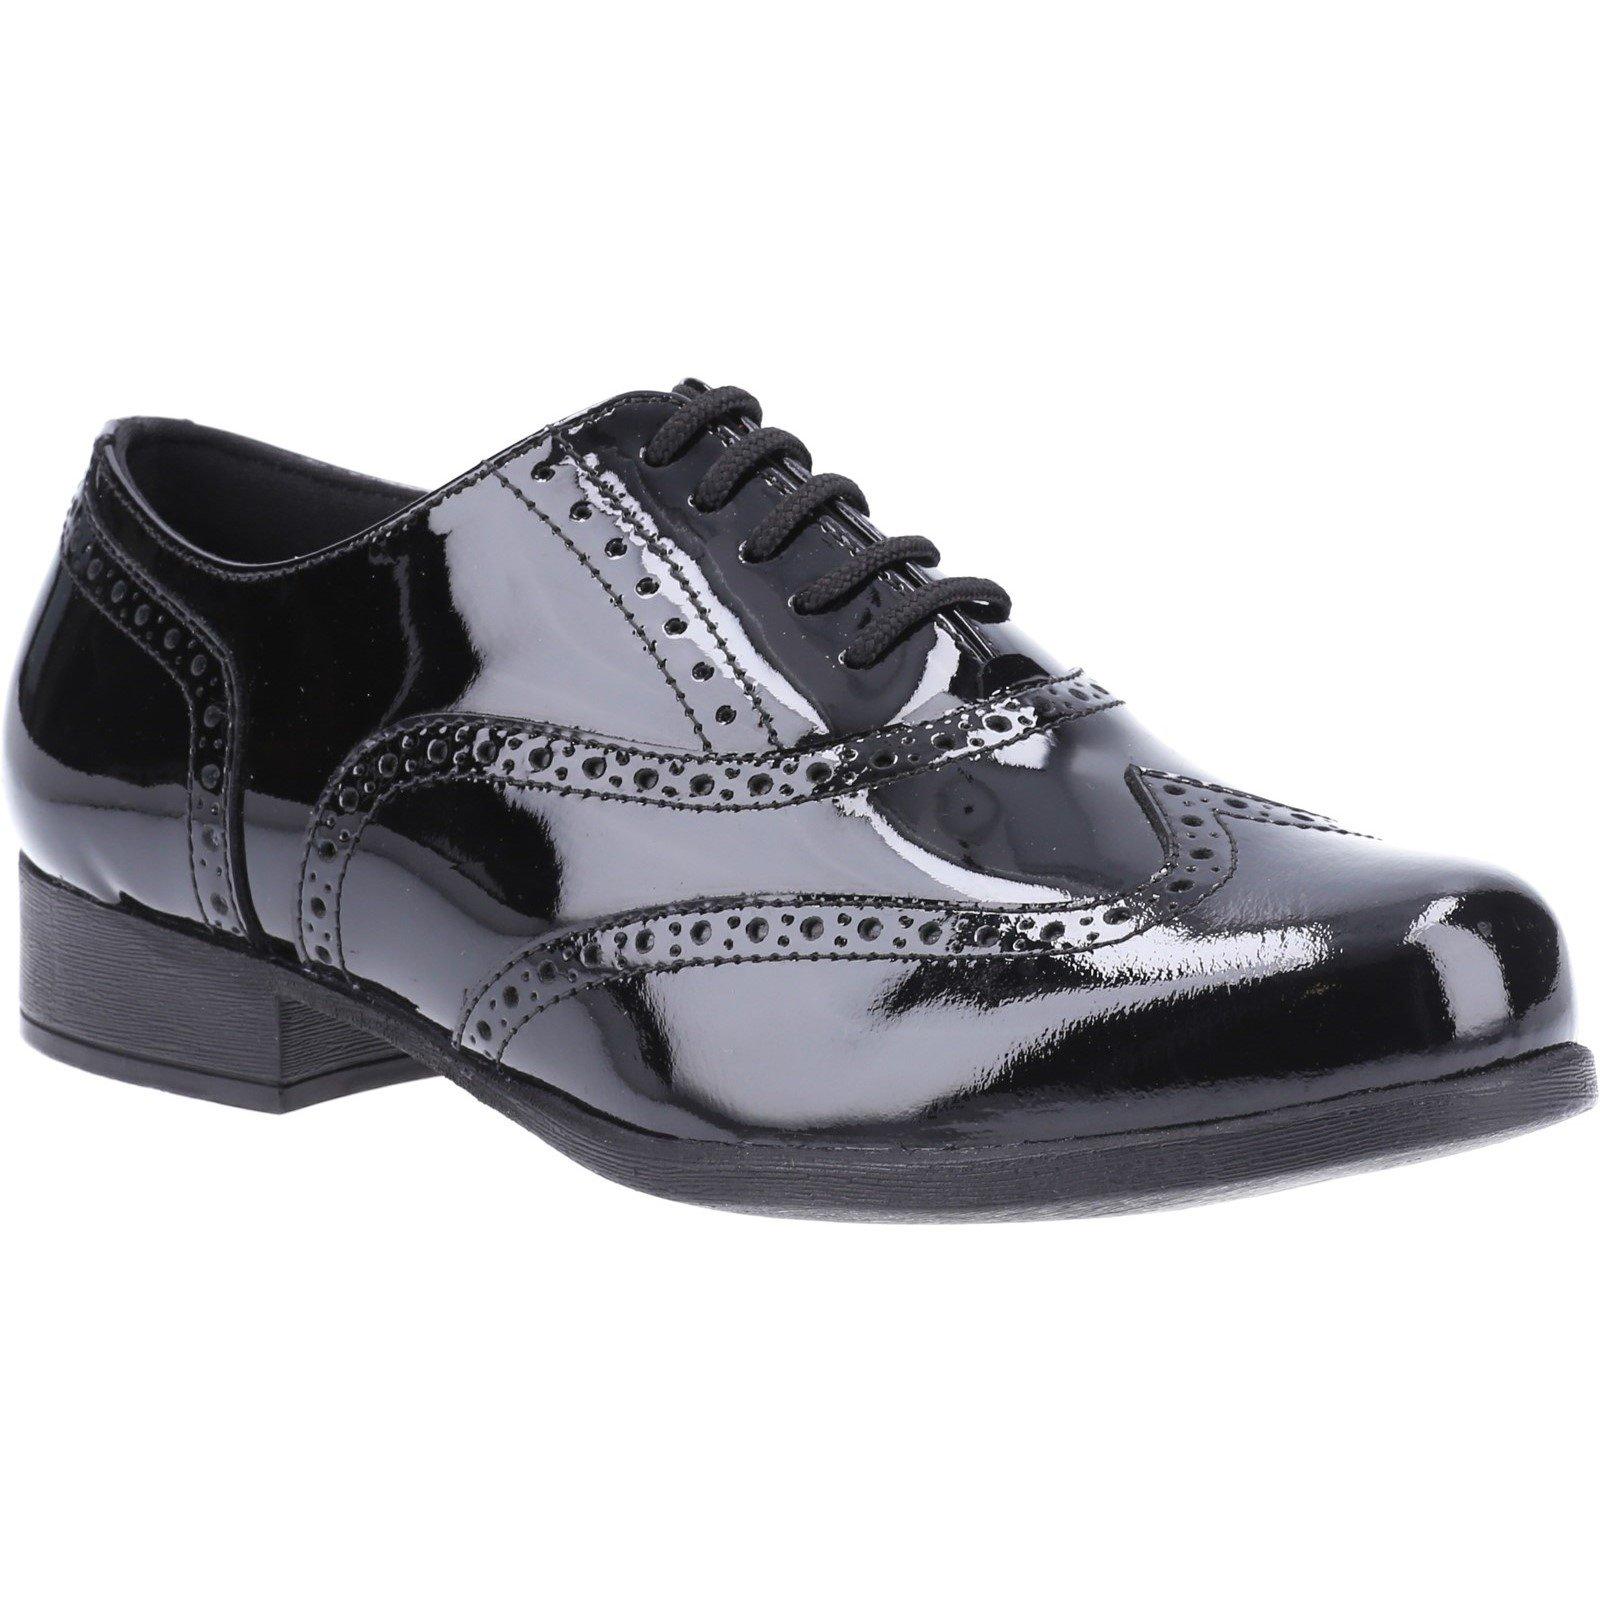 Hush Puppies Kid's Kada Junior School Brogue Shoe Patent Black 32597 - Patent Black 1